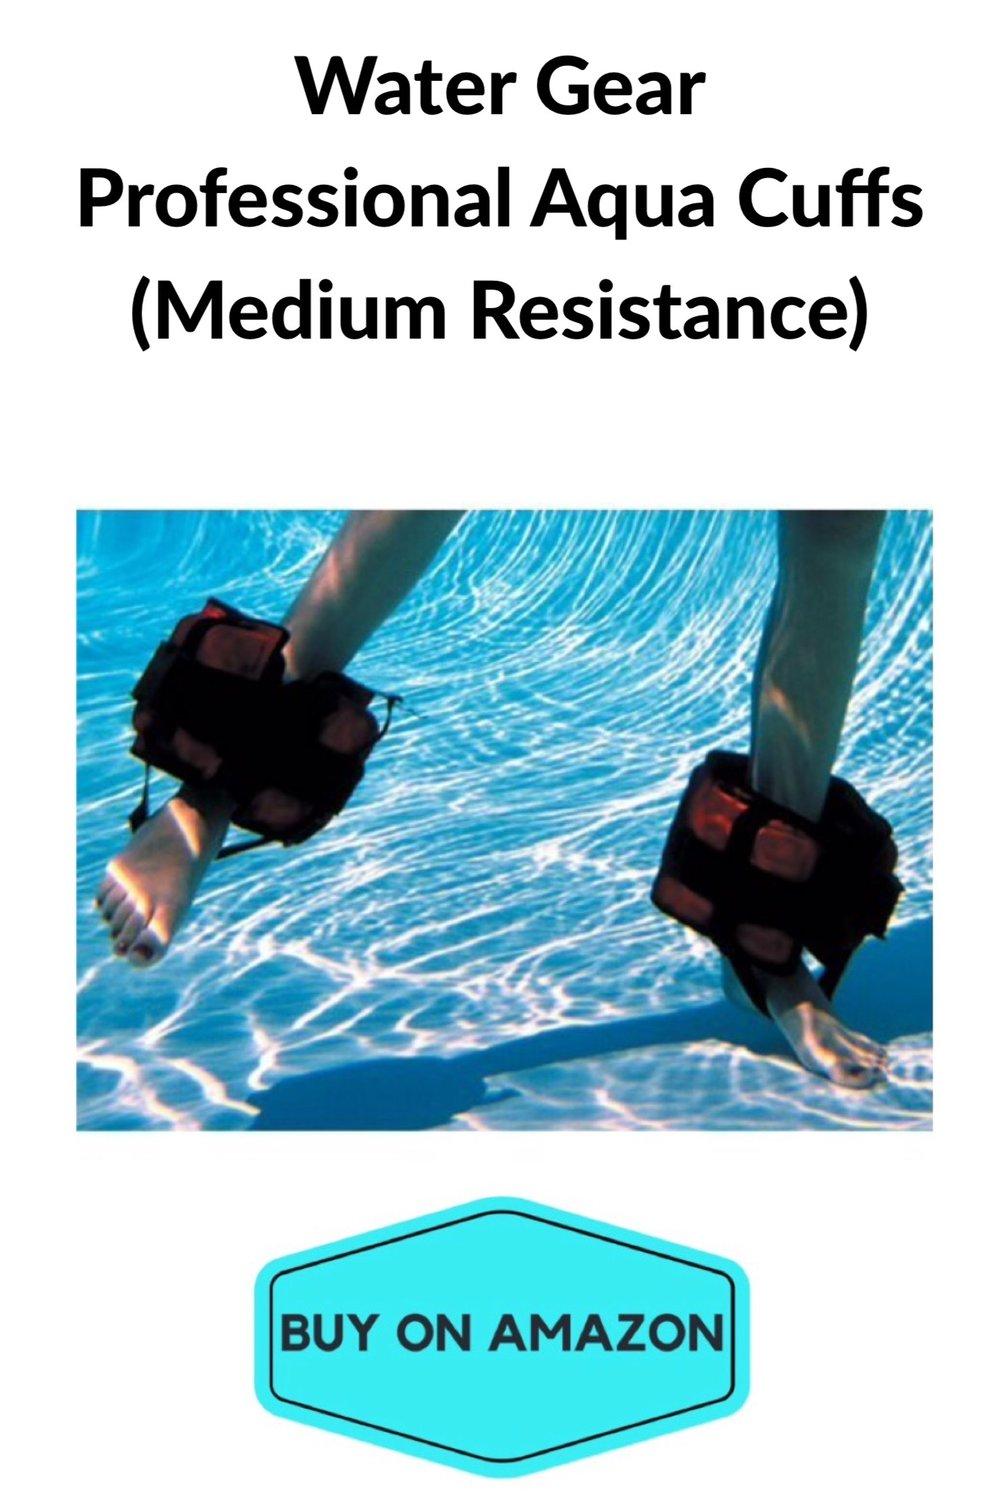 Professional Aqua Cuffs